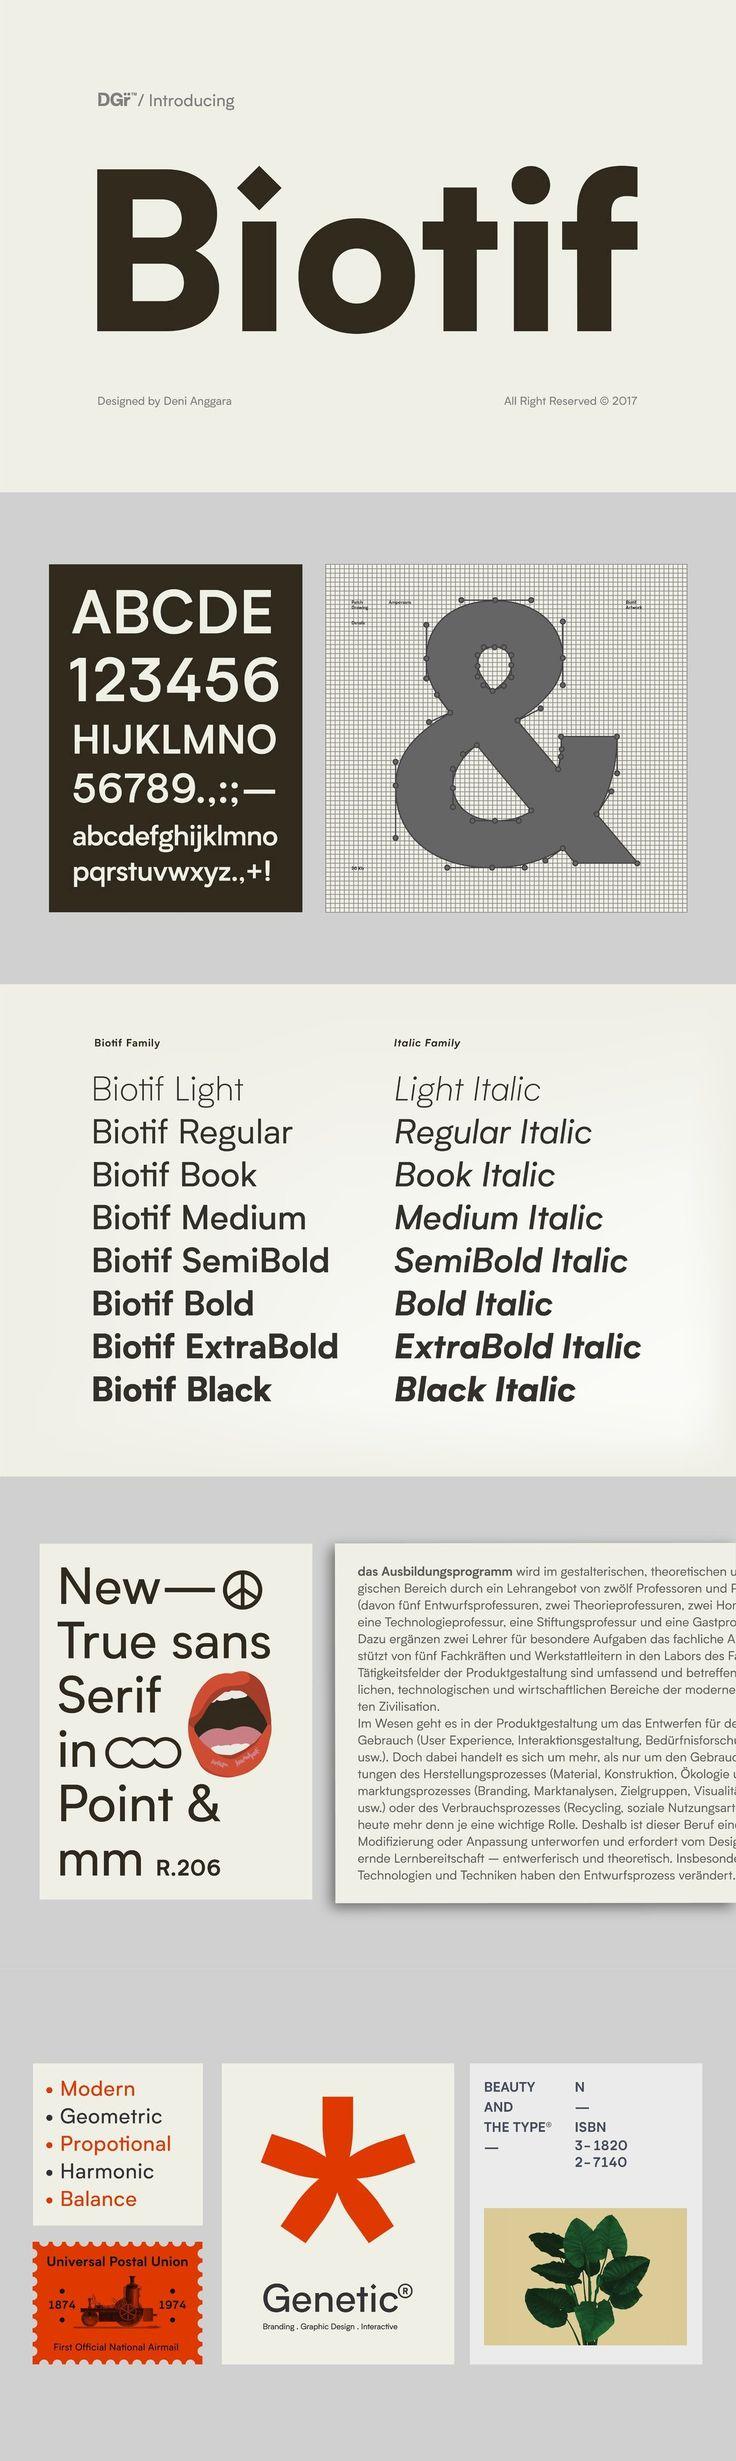 Biotif - Biotif is a 16 weight, geometric, sans-serif font design, inspired by modern style as well as indu...